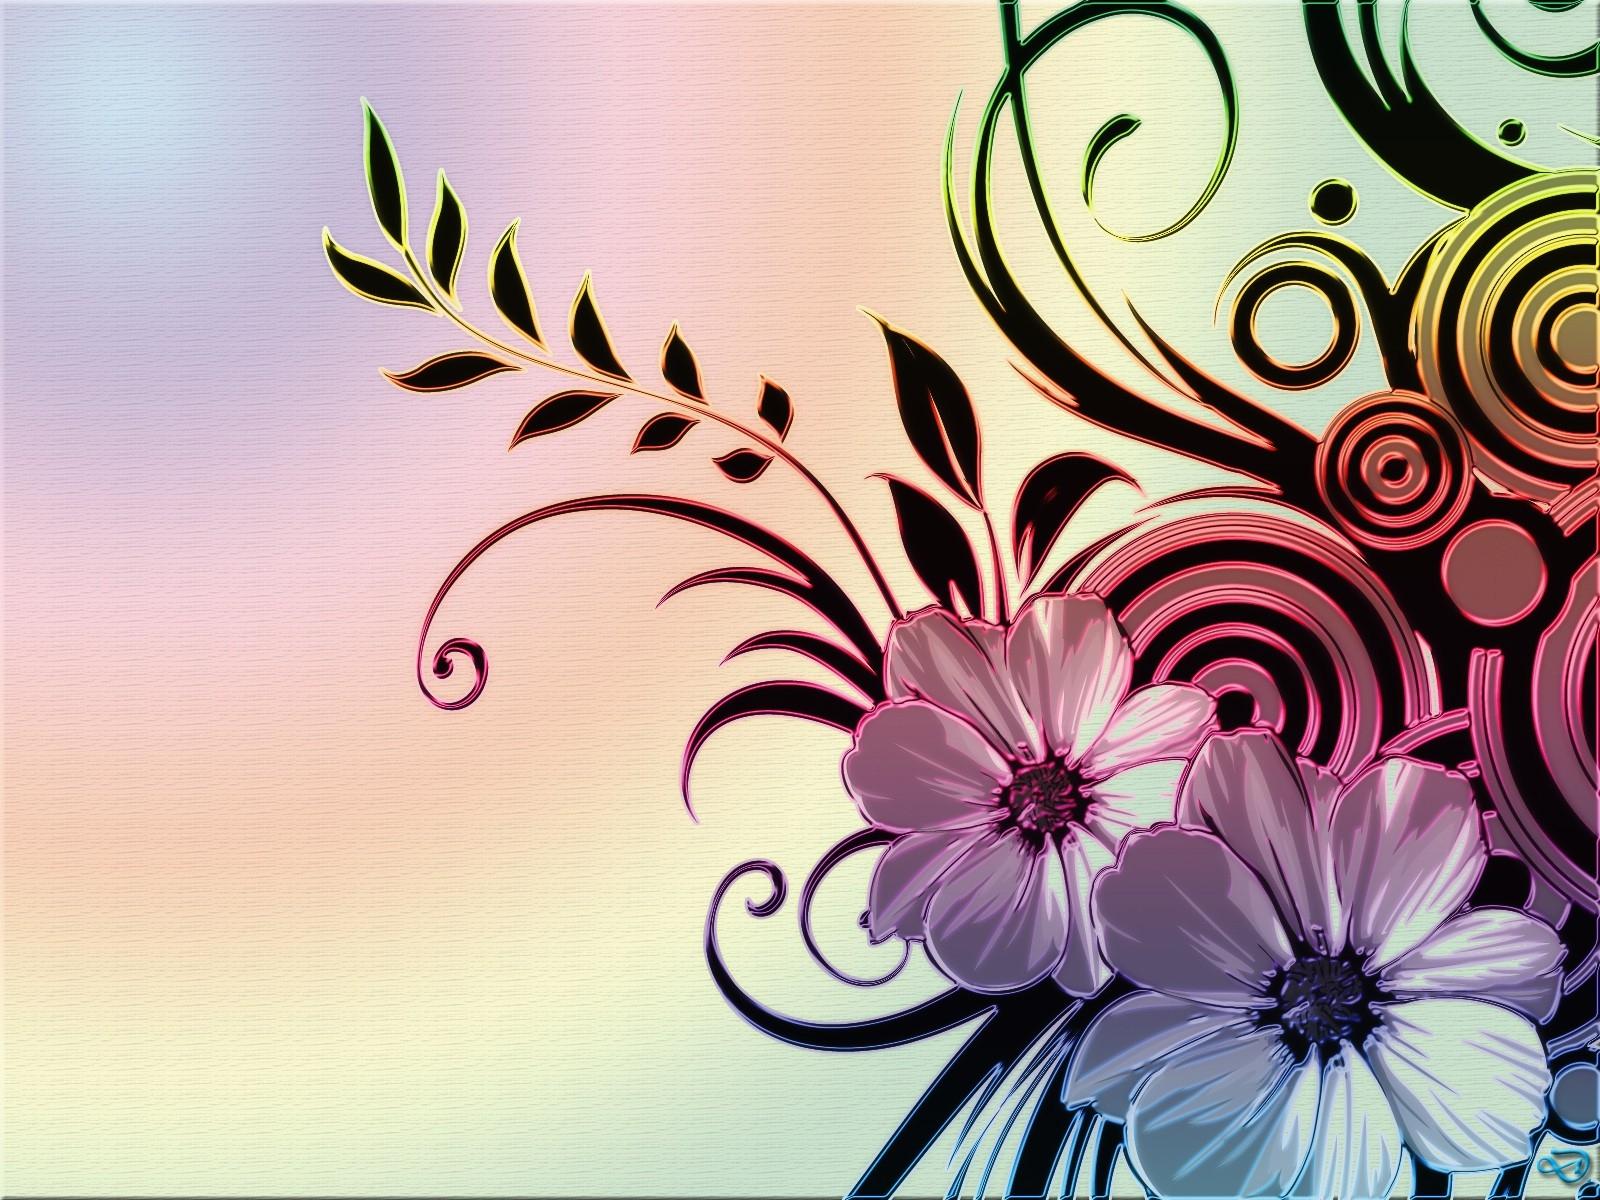 Wallpaper Illustration Flowers Graphic Design Pattern Pink